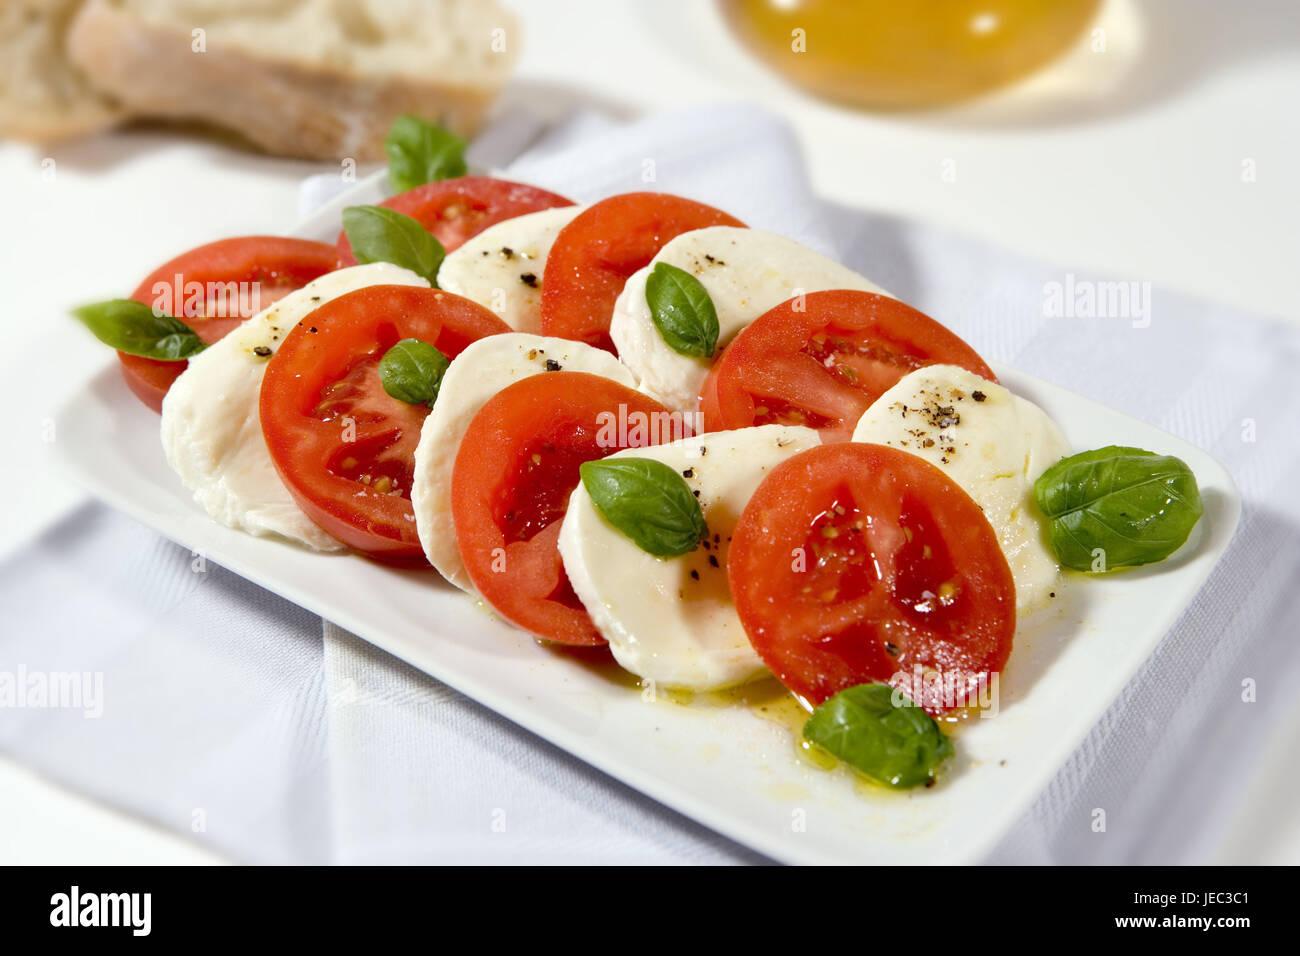 Tomate-Mozzarella, Mozzarella-Salat, eingeschaltet, Zutaten, Tomaten, Mozzarella, Basilikum Lamelle, Olivenöl, Stockbild